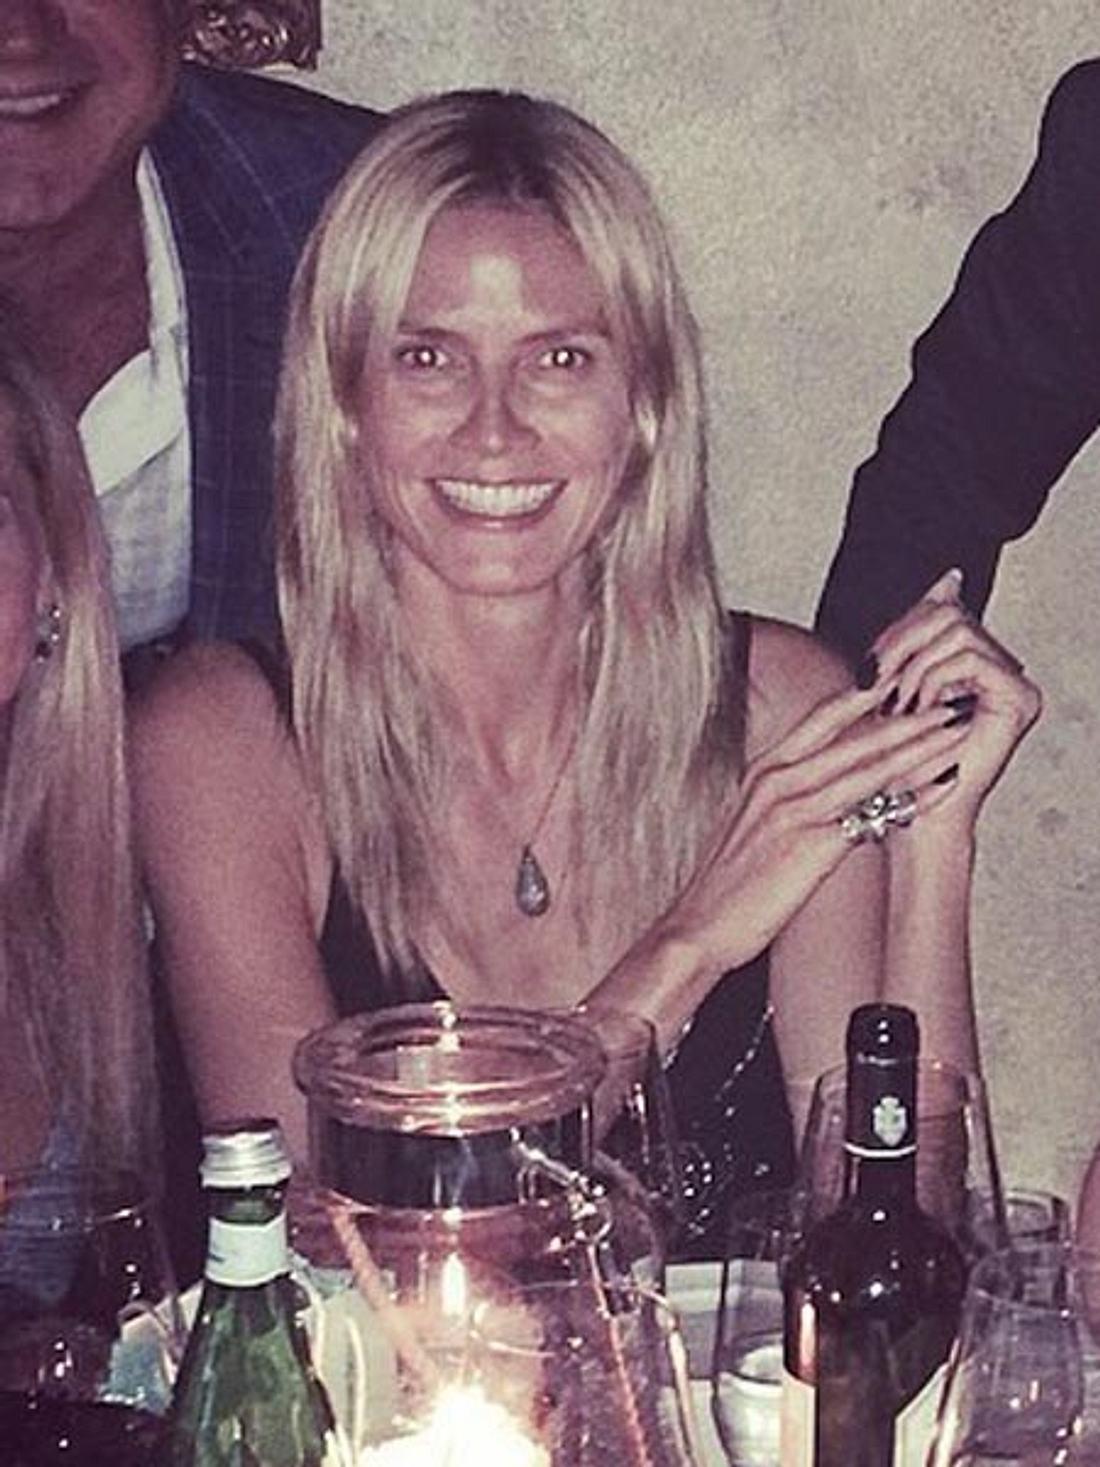 Heidi Klum zeigt sich ungeschminkt